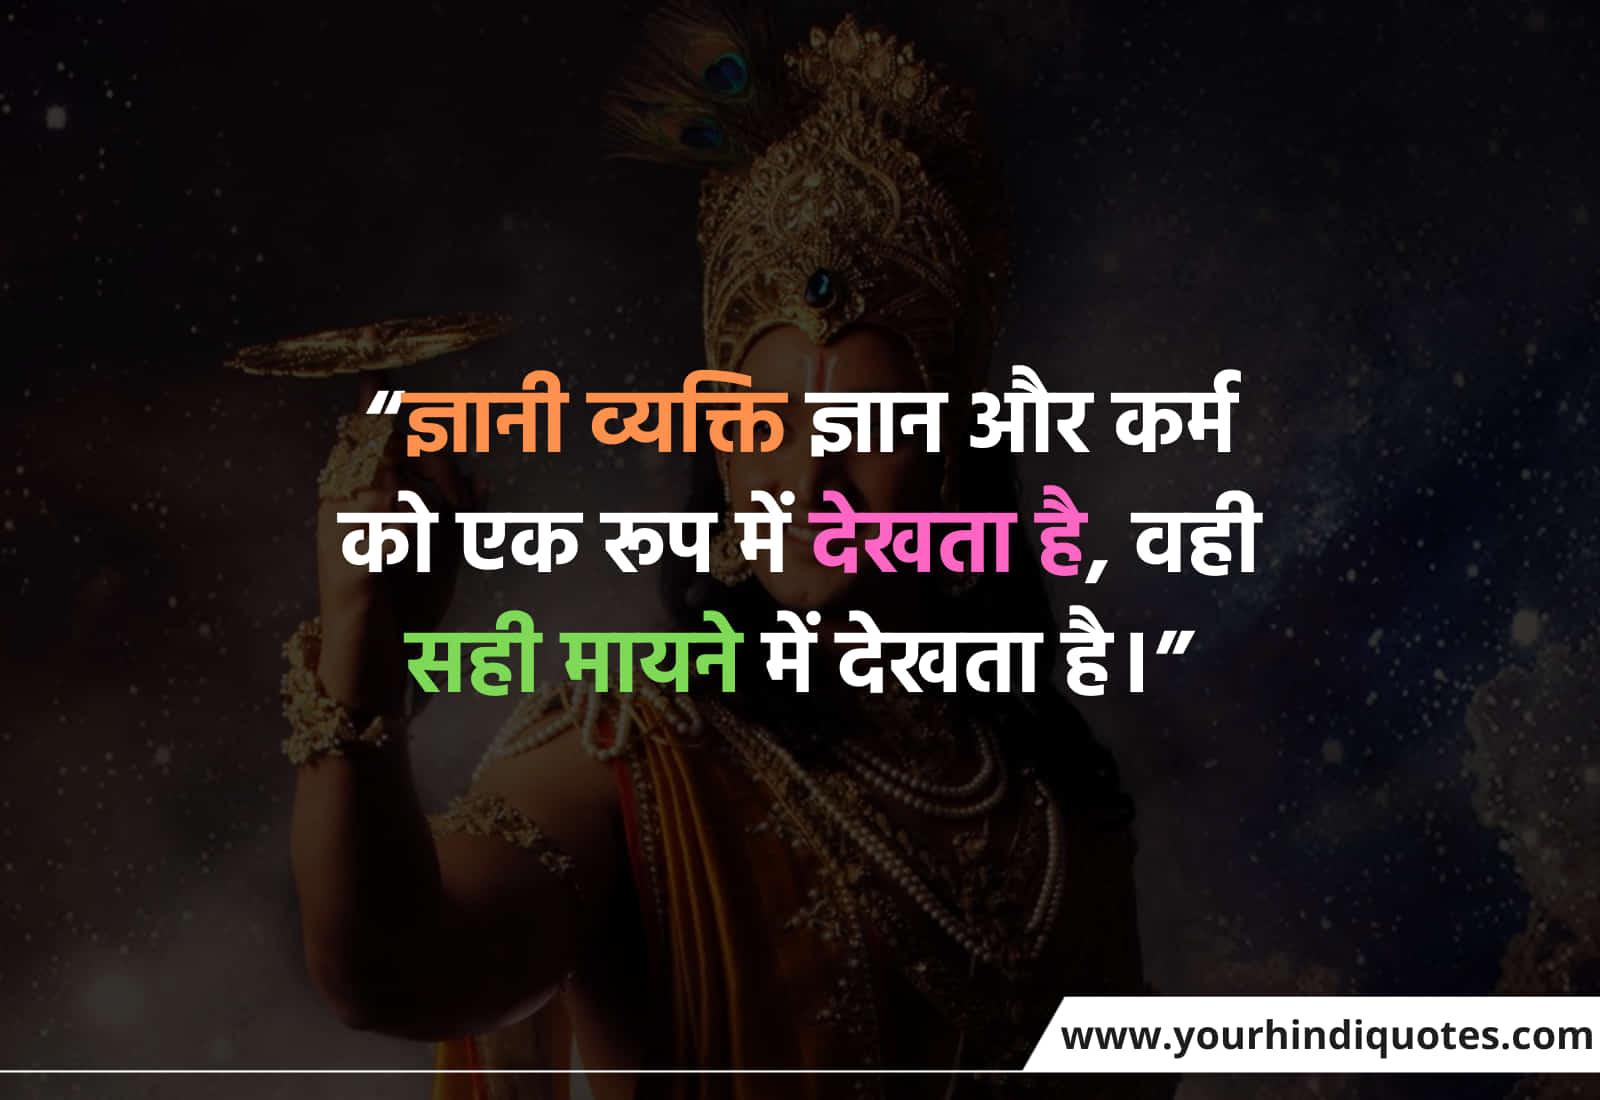 Bhagwat Gita Quotes For Life In Hindi